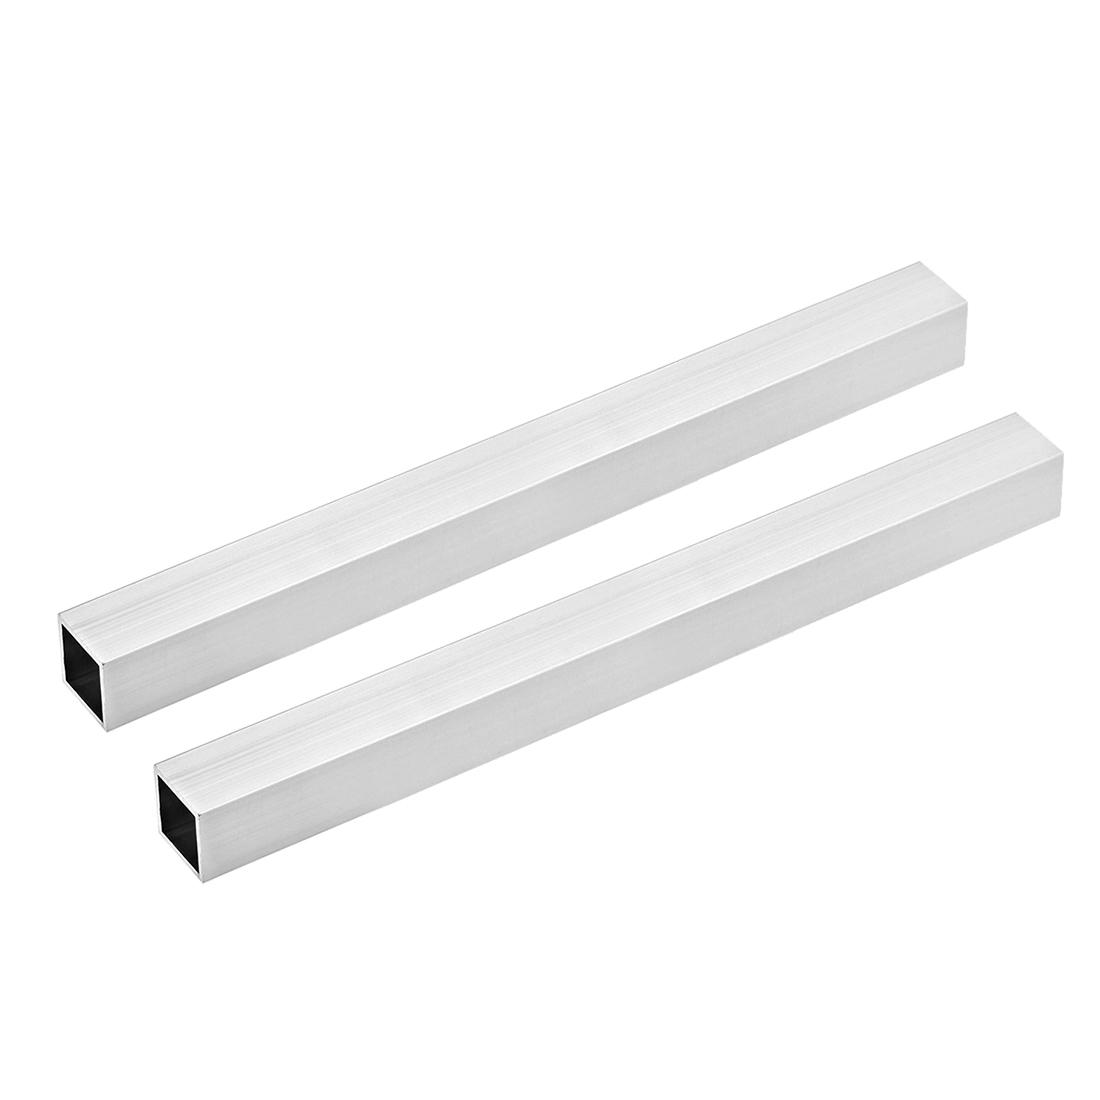 6063 Aluminum Square Tube 25mmx25mmx0.8mm Wall Thickness 300mm Long Tubing 2 Pcs